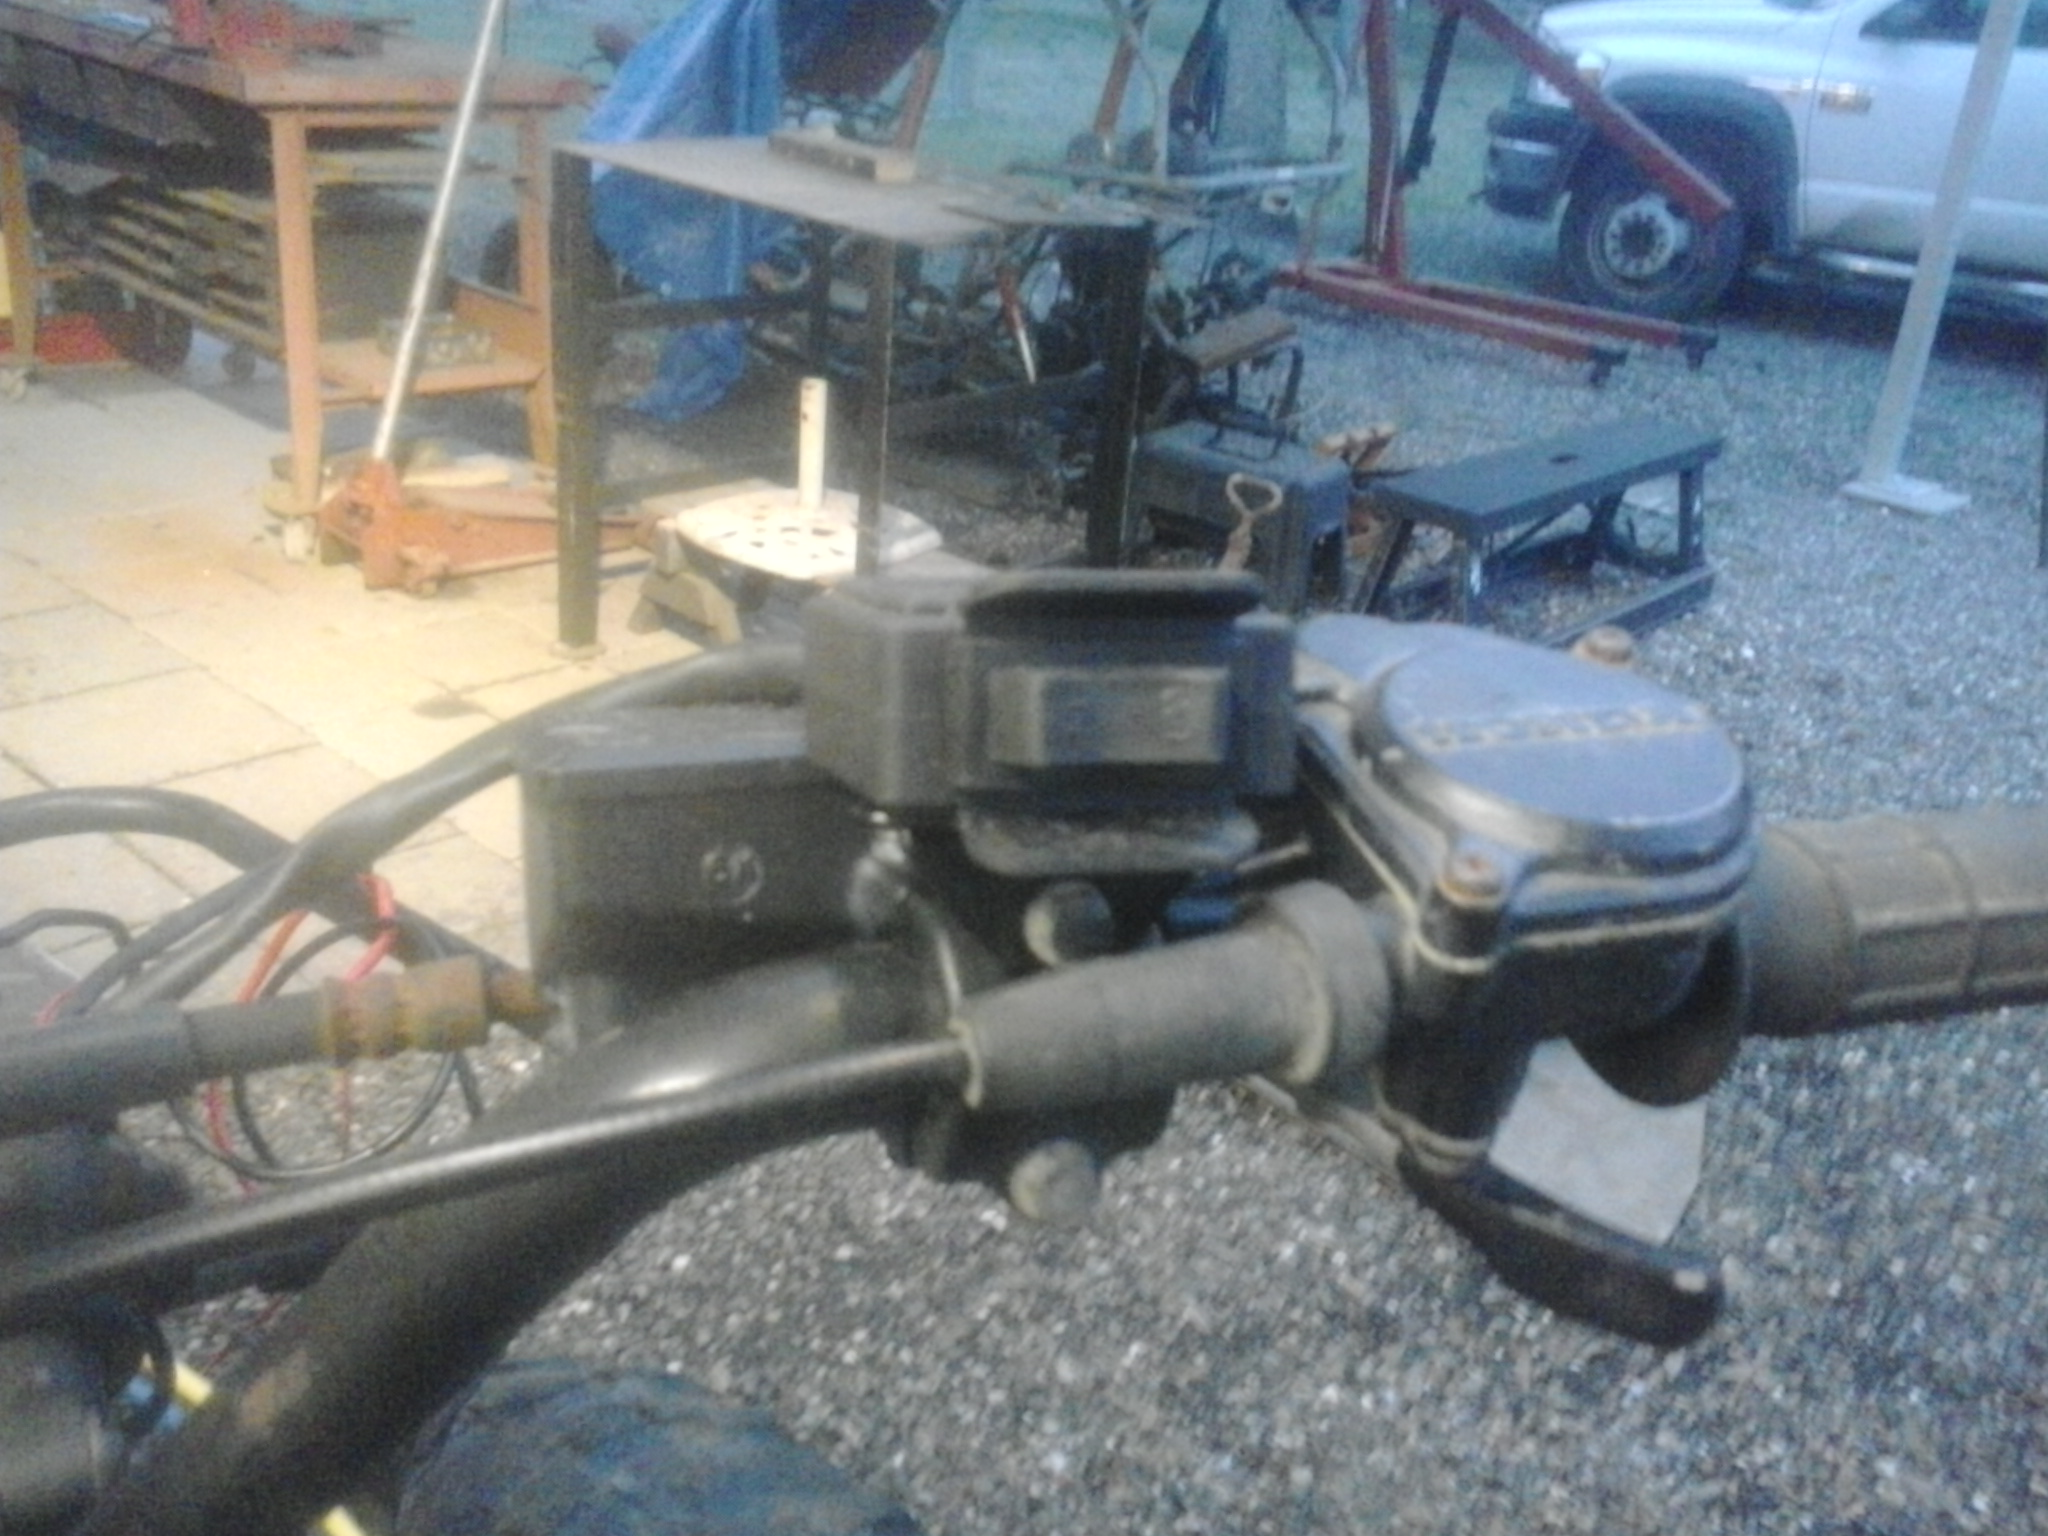 Honda Fourtrax Atv Traxlok Rancher Foreman Rubicon in addition D Fourtrax New Project Img additionally Fourtraxrincon X Beige E F besides Jmapq additionally Need Help Identifying Model Uploadfromtaptalk. on honda 300 fourtrax rear end